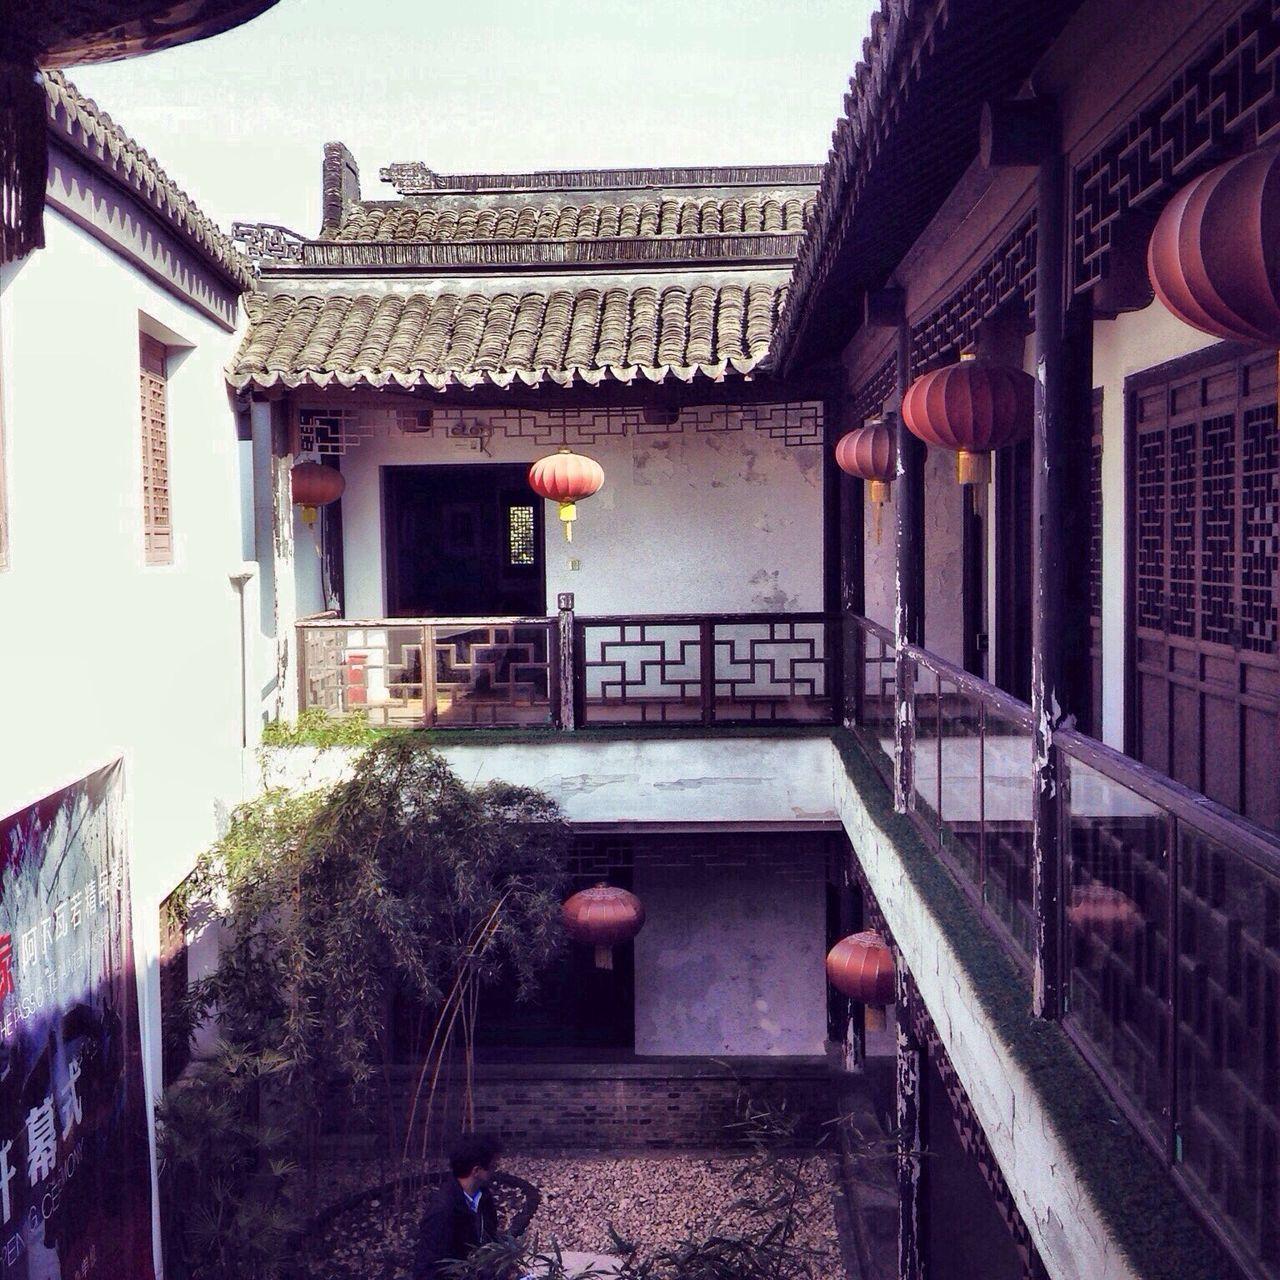 Building Exterior Art Gallery Art Gallery Artgallery Gallery Of Art Zhujiajiao Shanghai China